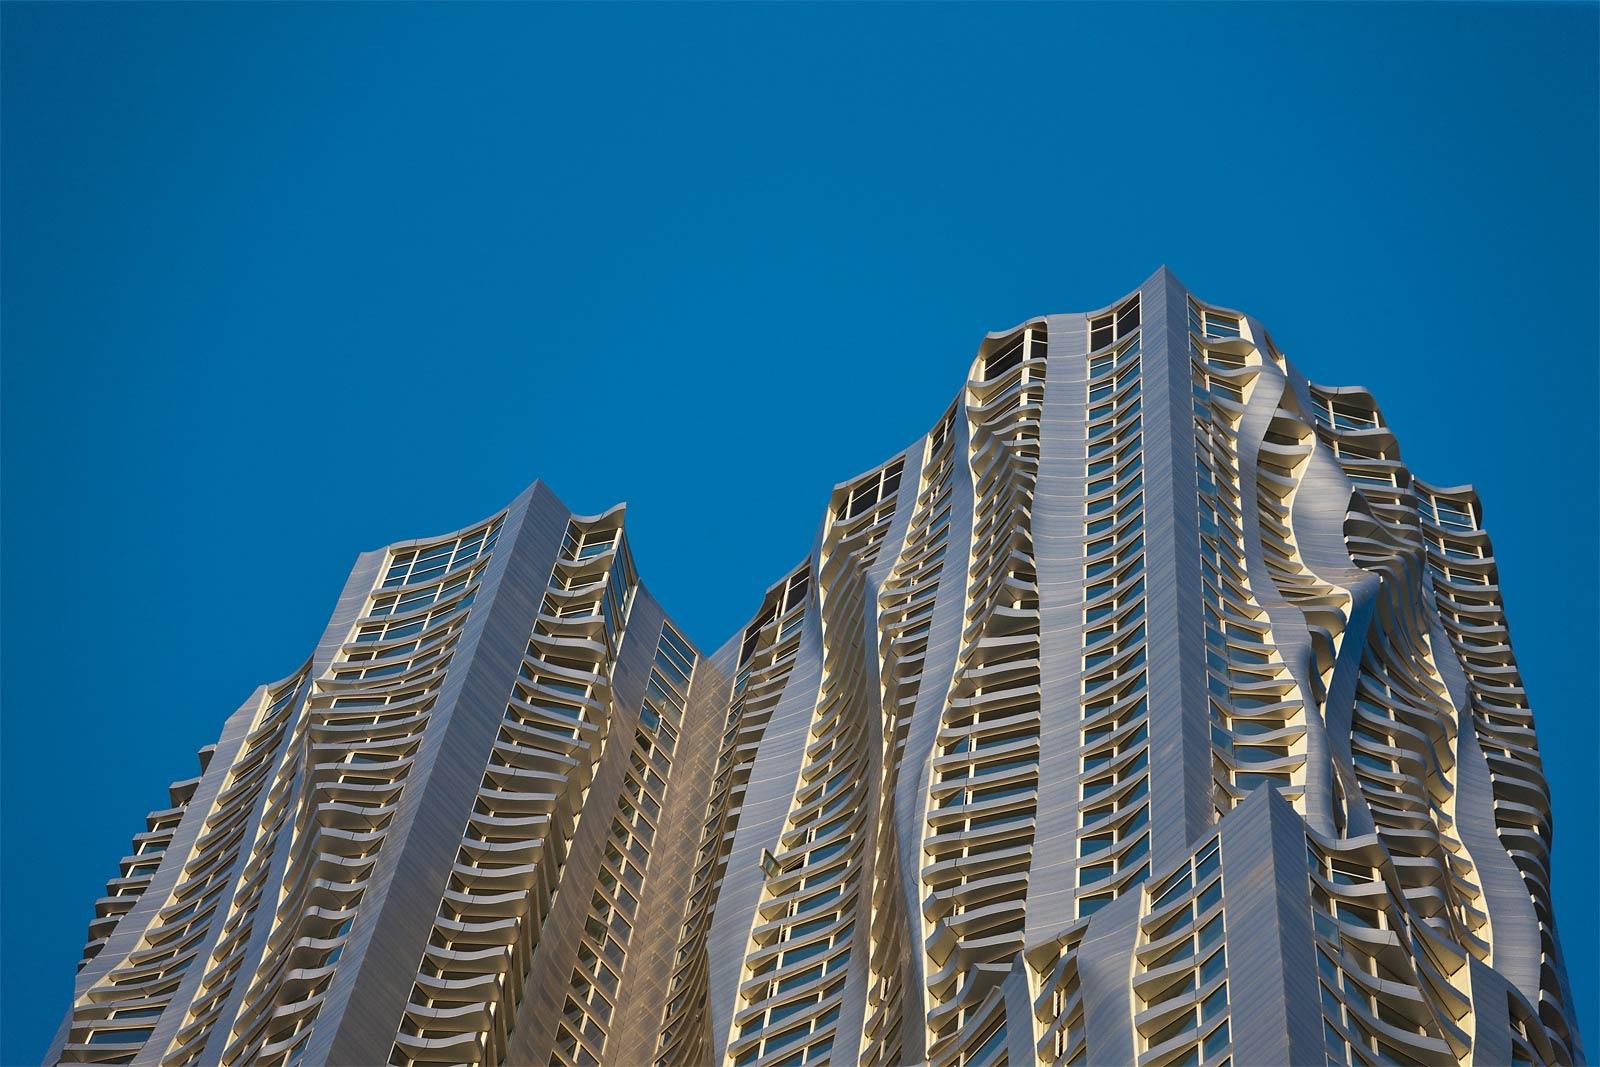 https://i1.wp.com/www.hauteresidence.com/wp-content/uploads/2013/03/Frank_Gehry_New_York.jpeg